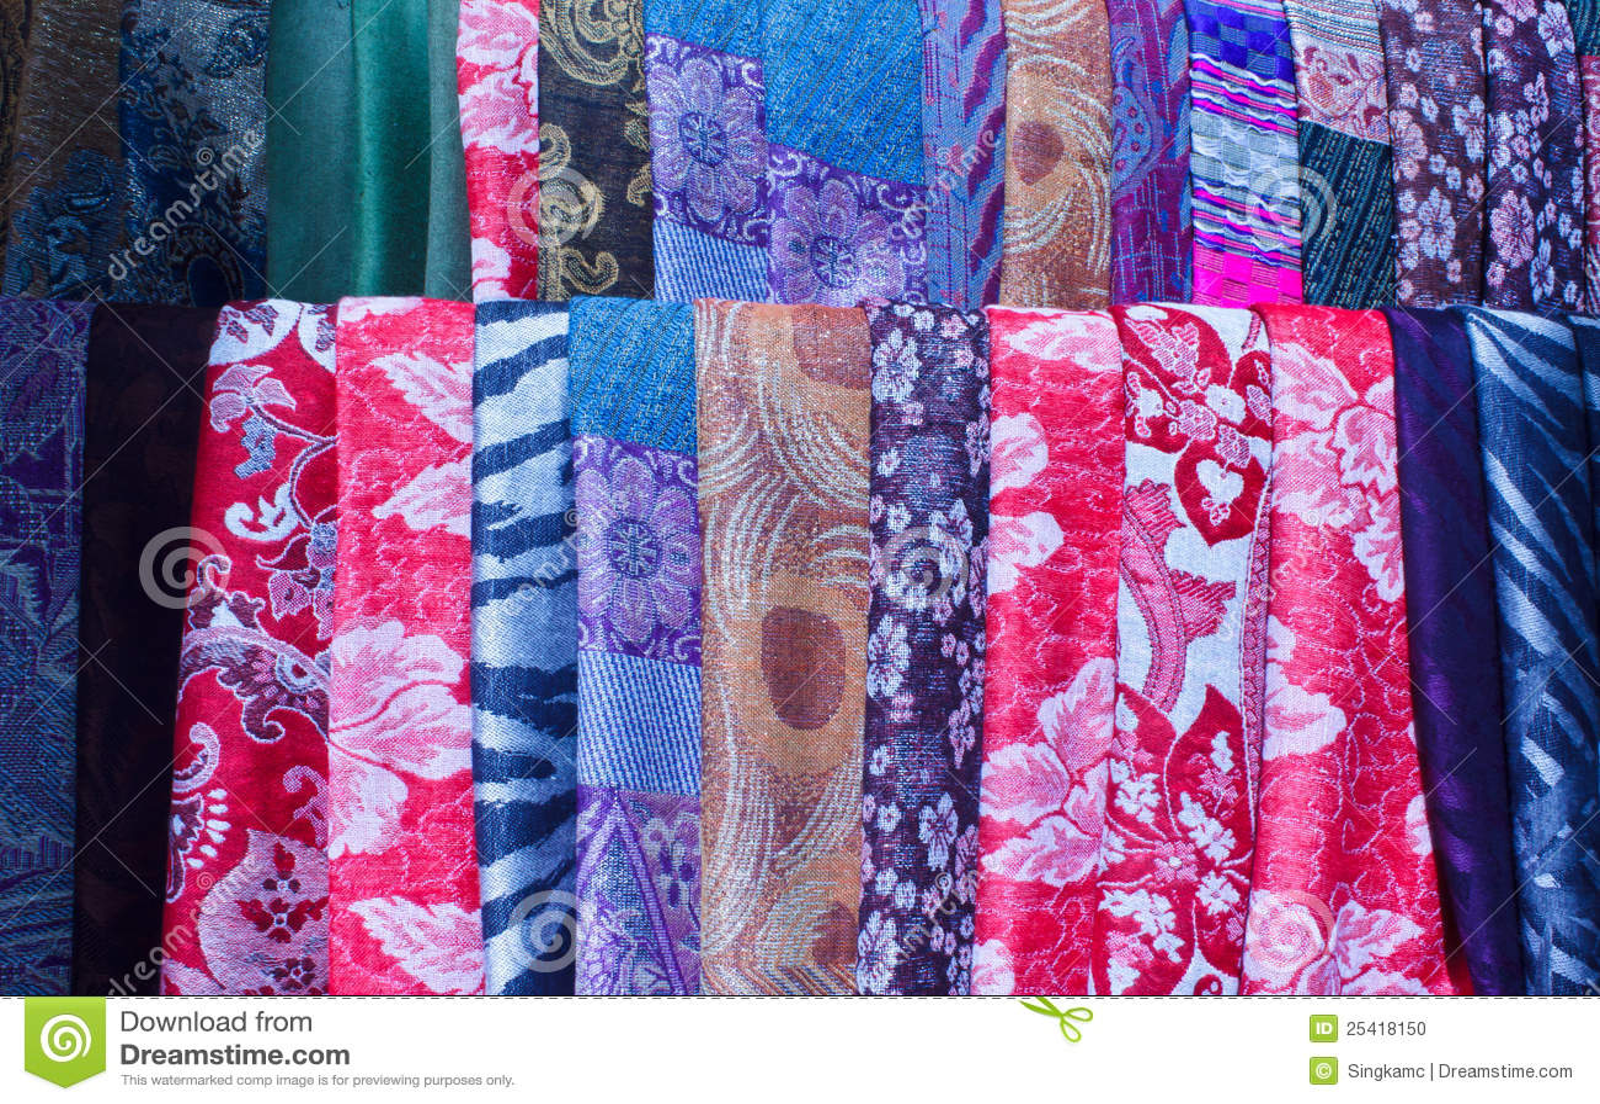 Beaux tissus color s photo stock image 25418150 - Tissus bohemes colores ...